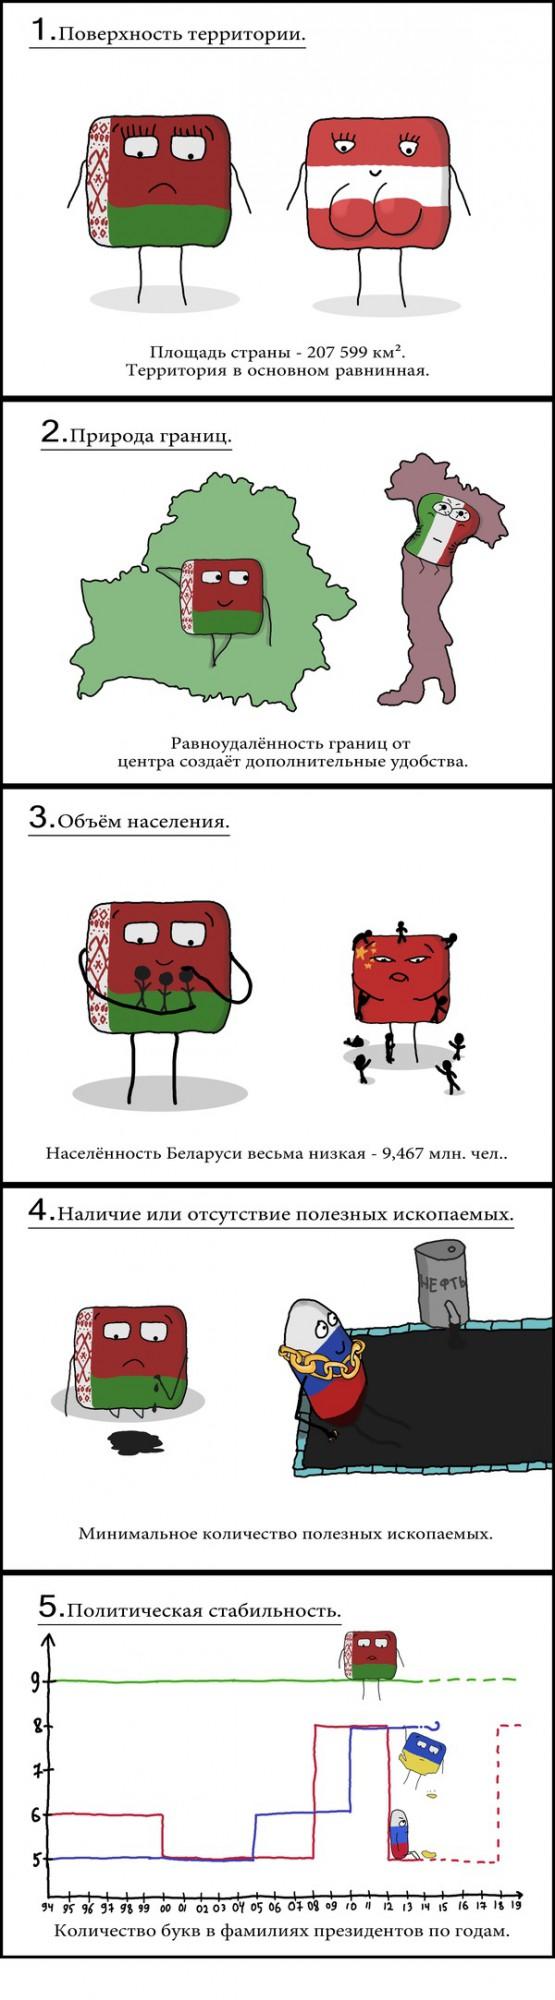 Анализ геополитического потенциала Беларуси